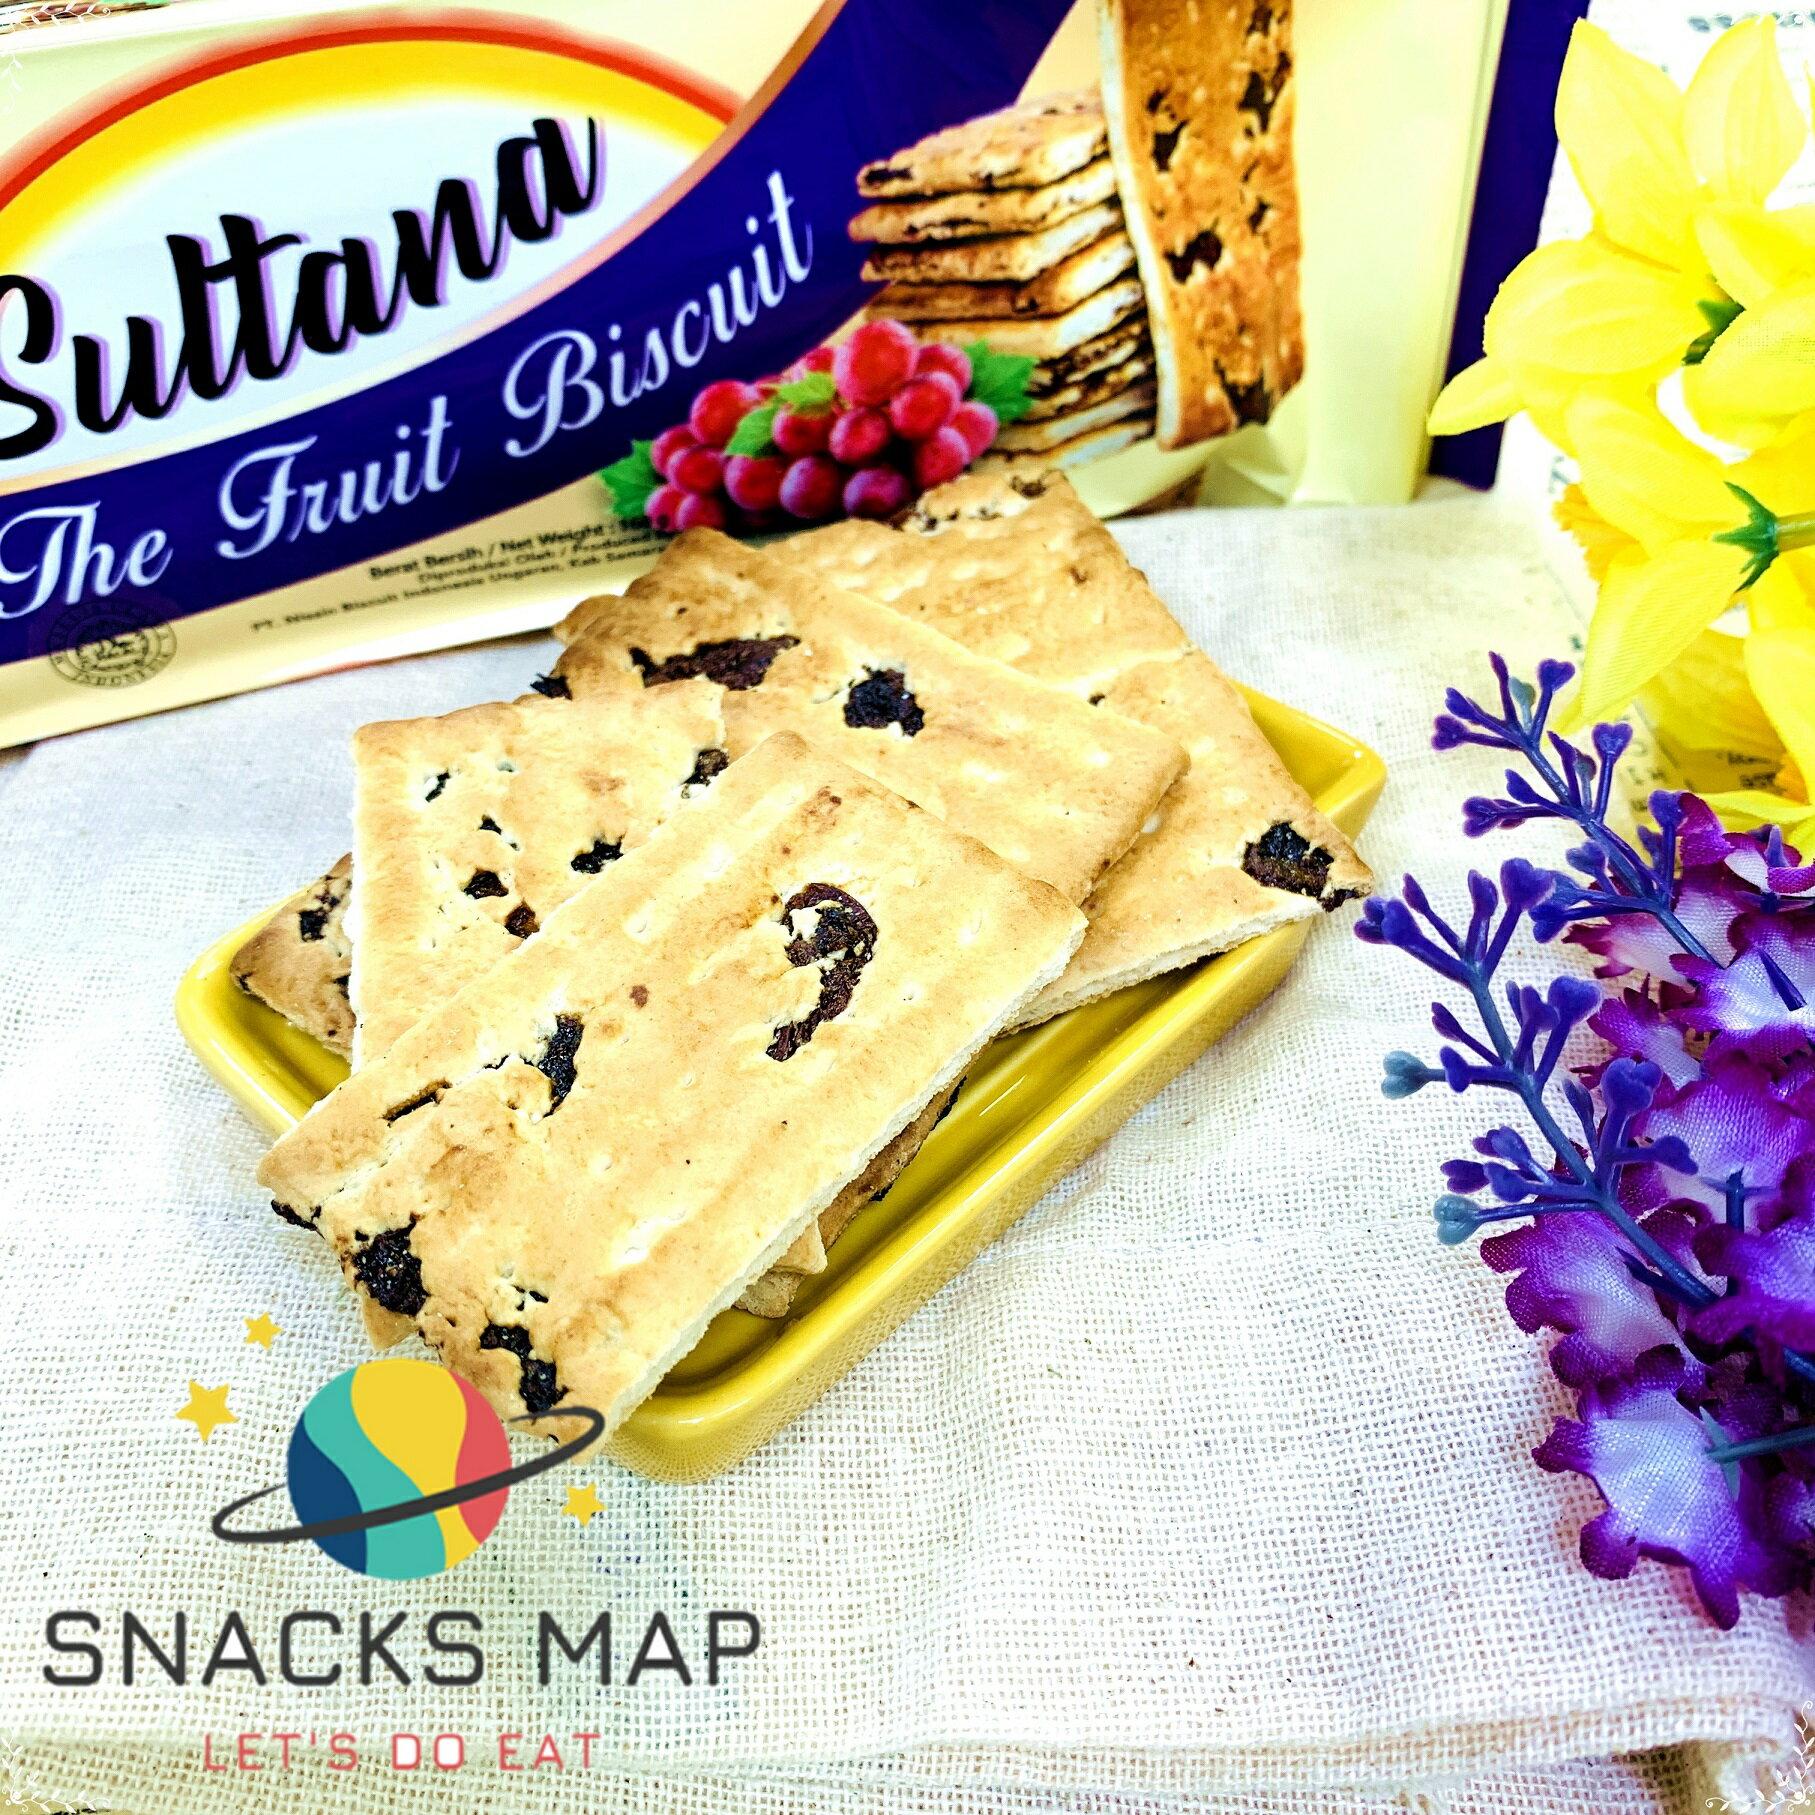 [SNACKS MAP零食地圖]華倫斯 葡萄餅 葡萄餅乾  160g  印尼  古早味餅乾 下午茶   葡萄乾餅乾